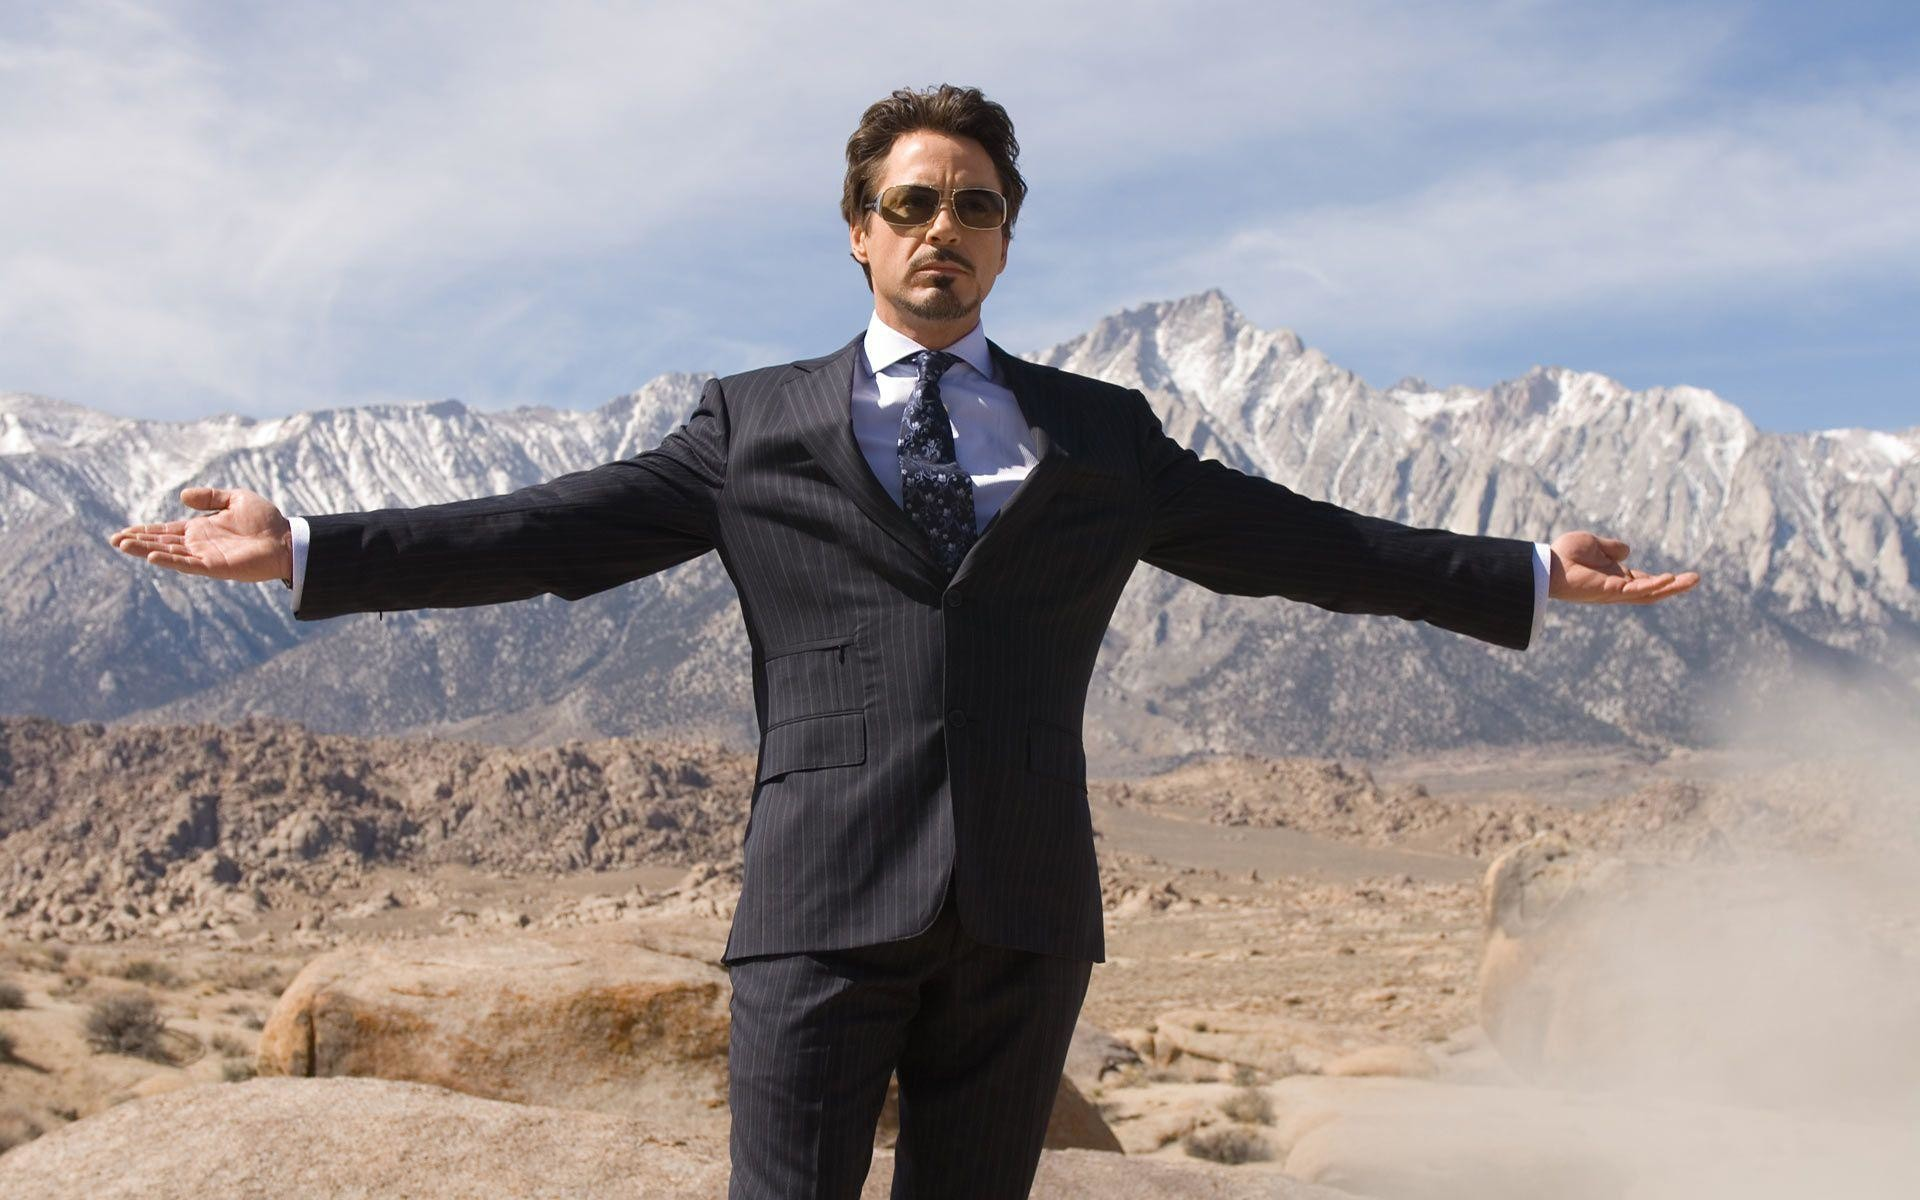 Robert Downey Jr Iron Man Wallpaper 71 images 1920x1200